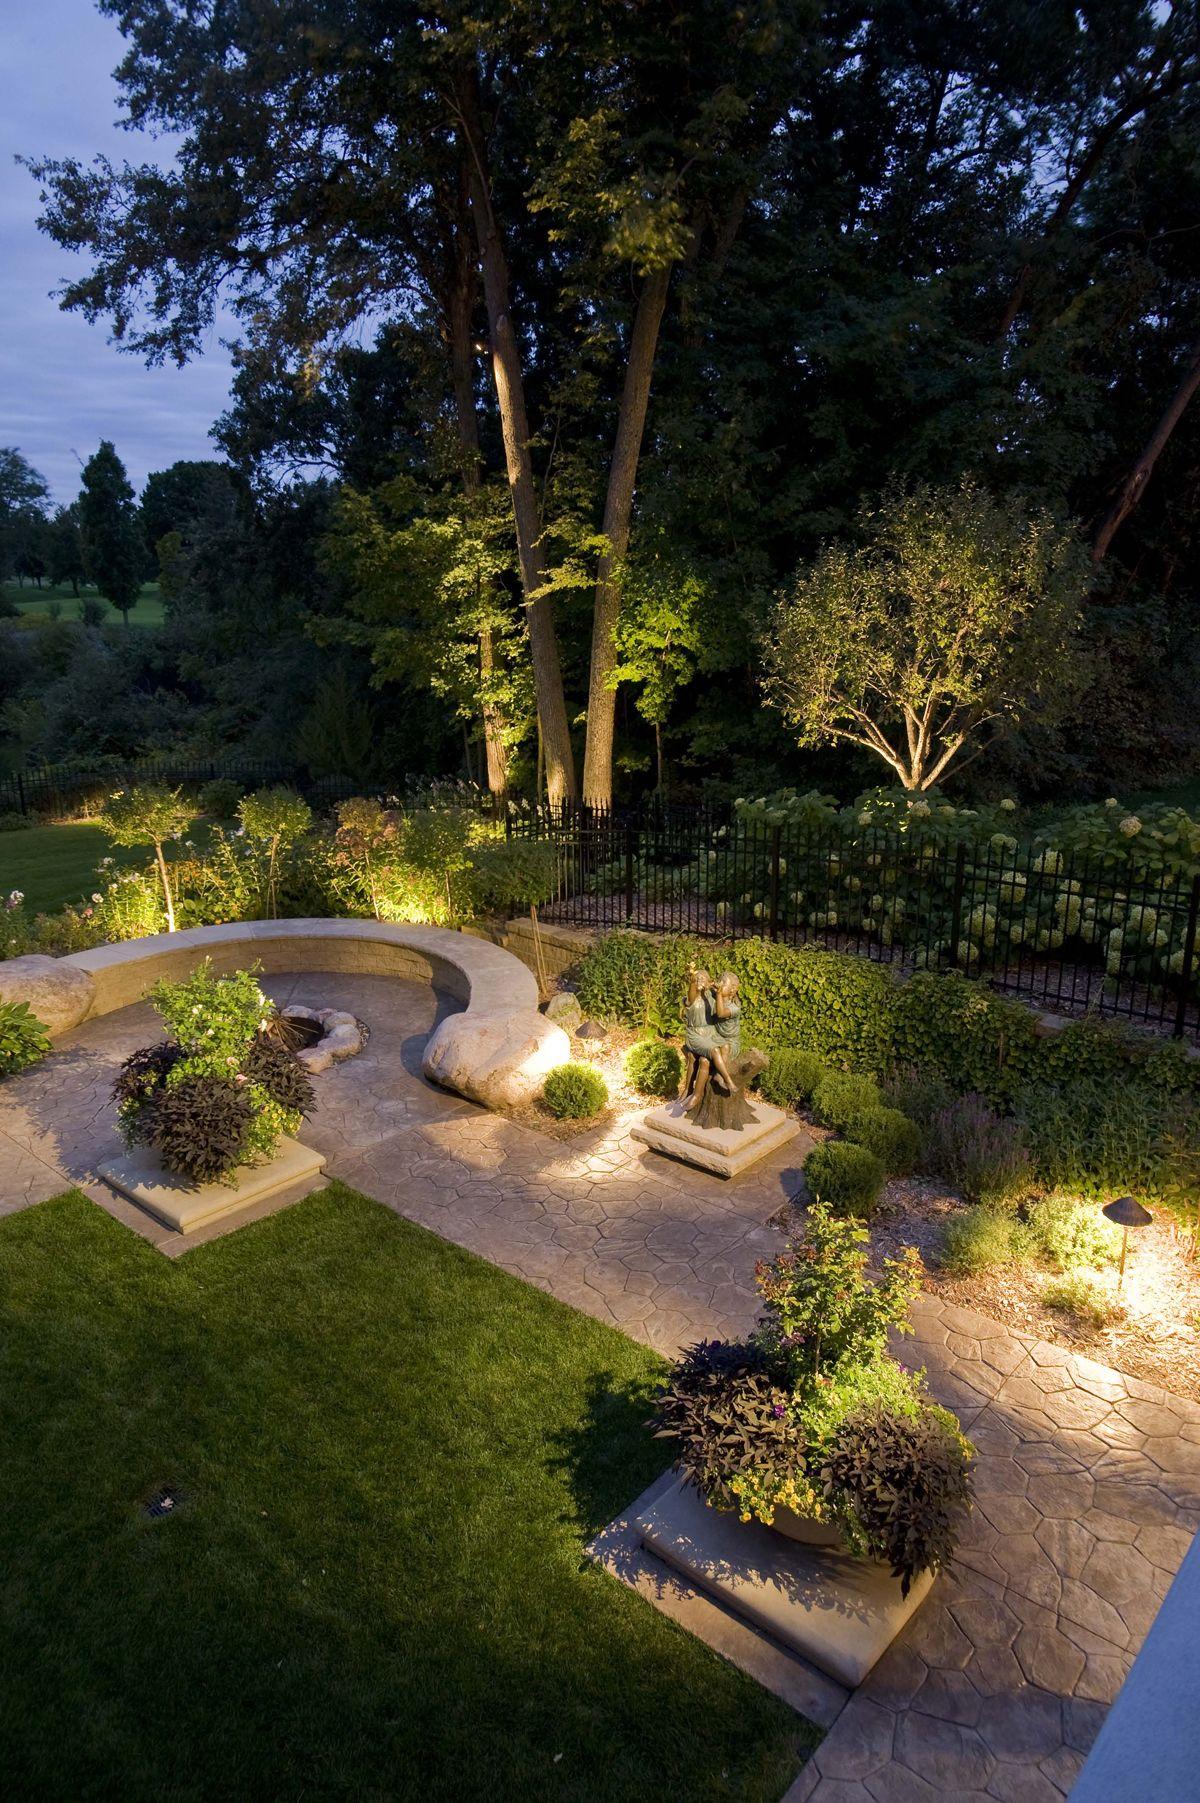 beautiful patio decoration with hadco lighting plus stone bench and garden - Beautiful Patio Decoration With Hadco Lighting Plus Stone Bench And